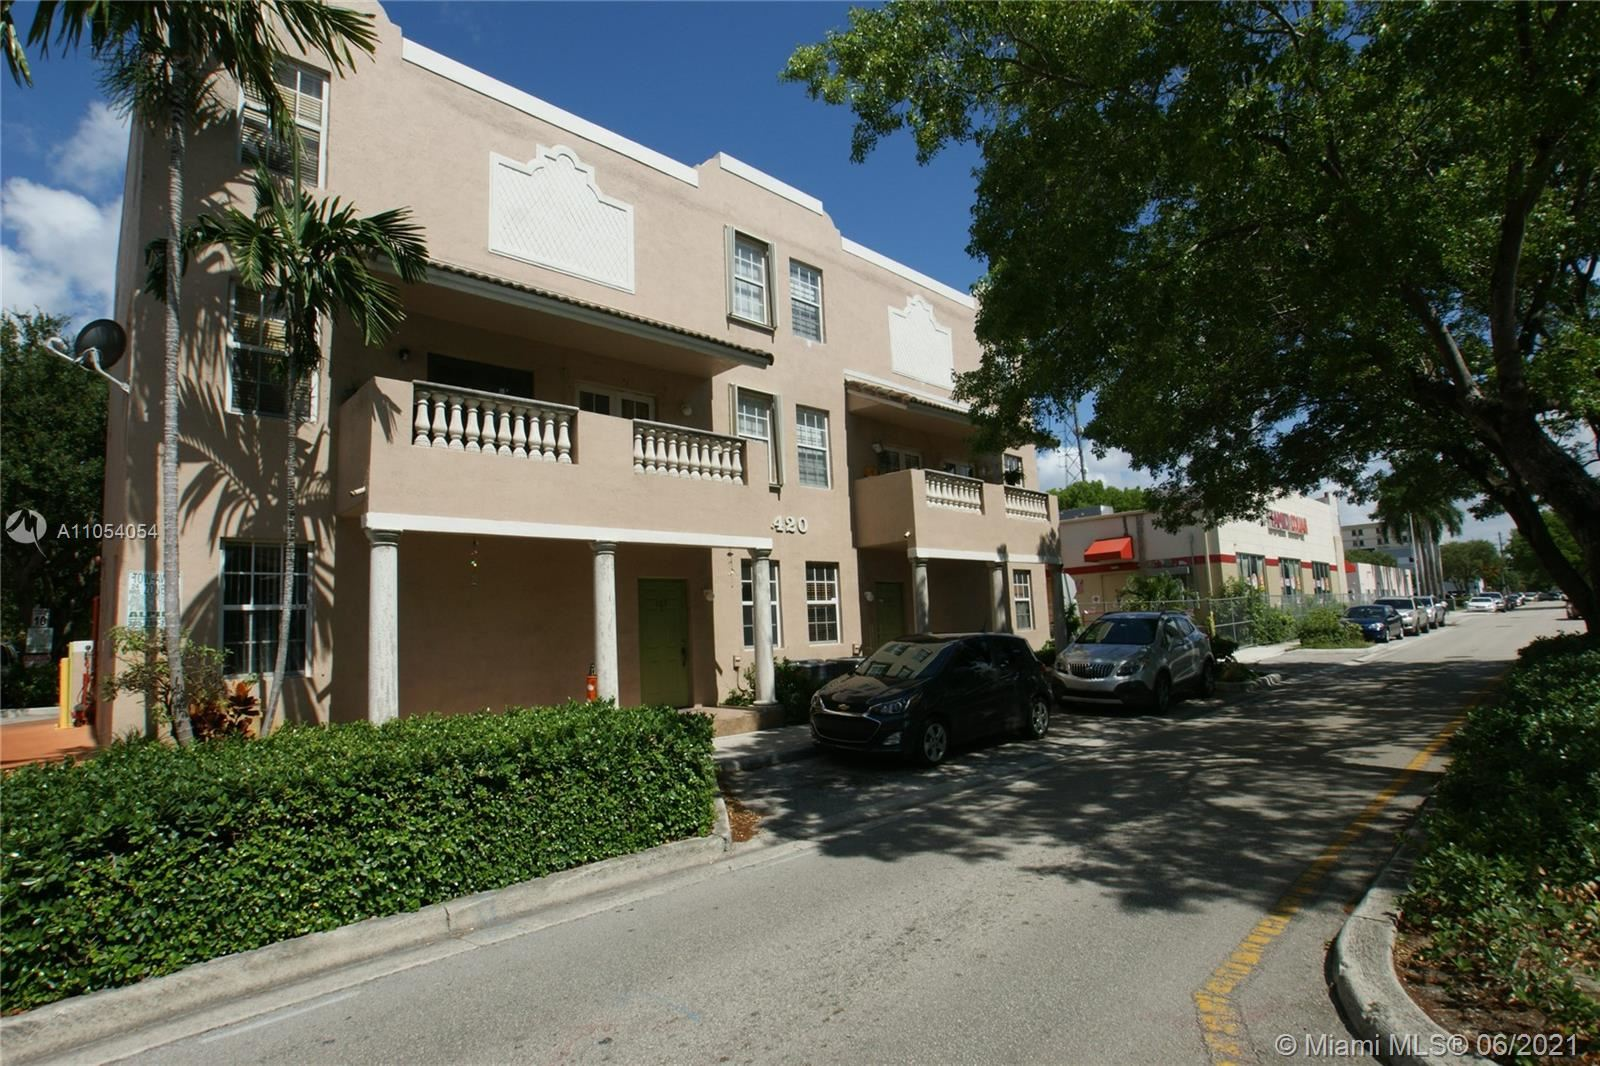 420 E 1st Avenue #B102, Hialeah, FL 33010 - #: A11054054